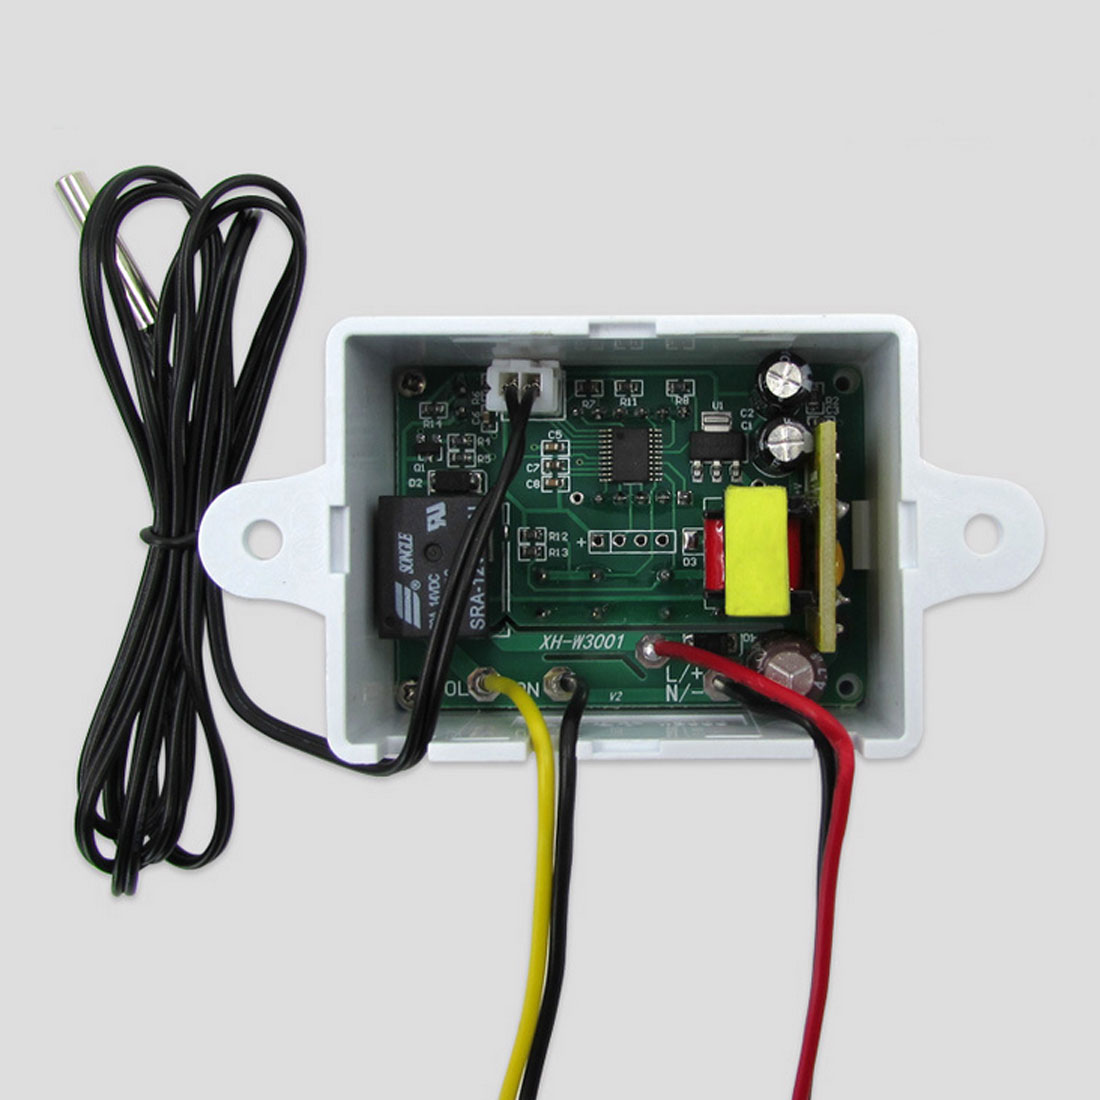 Nuevo-50 ~ 110C termostato Digital inteligente AC 220V 12V 24V 10A interruptor regulador de temperatura Digital